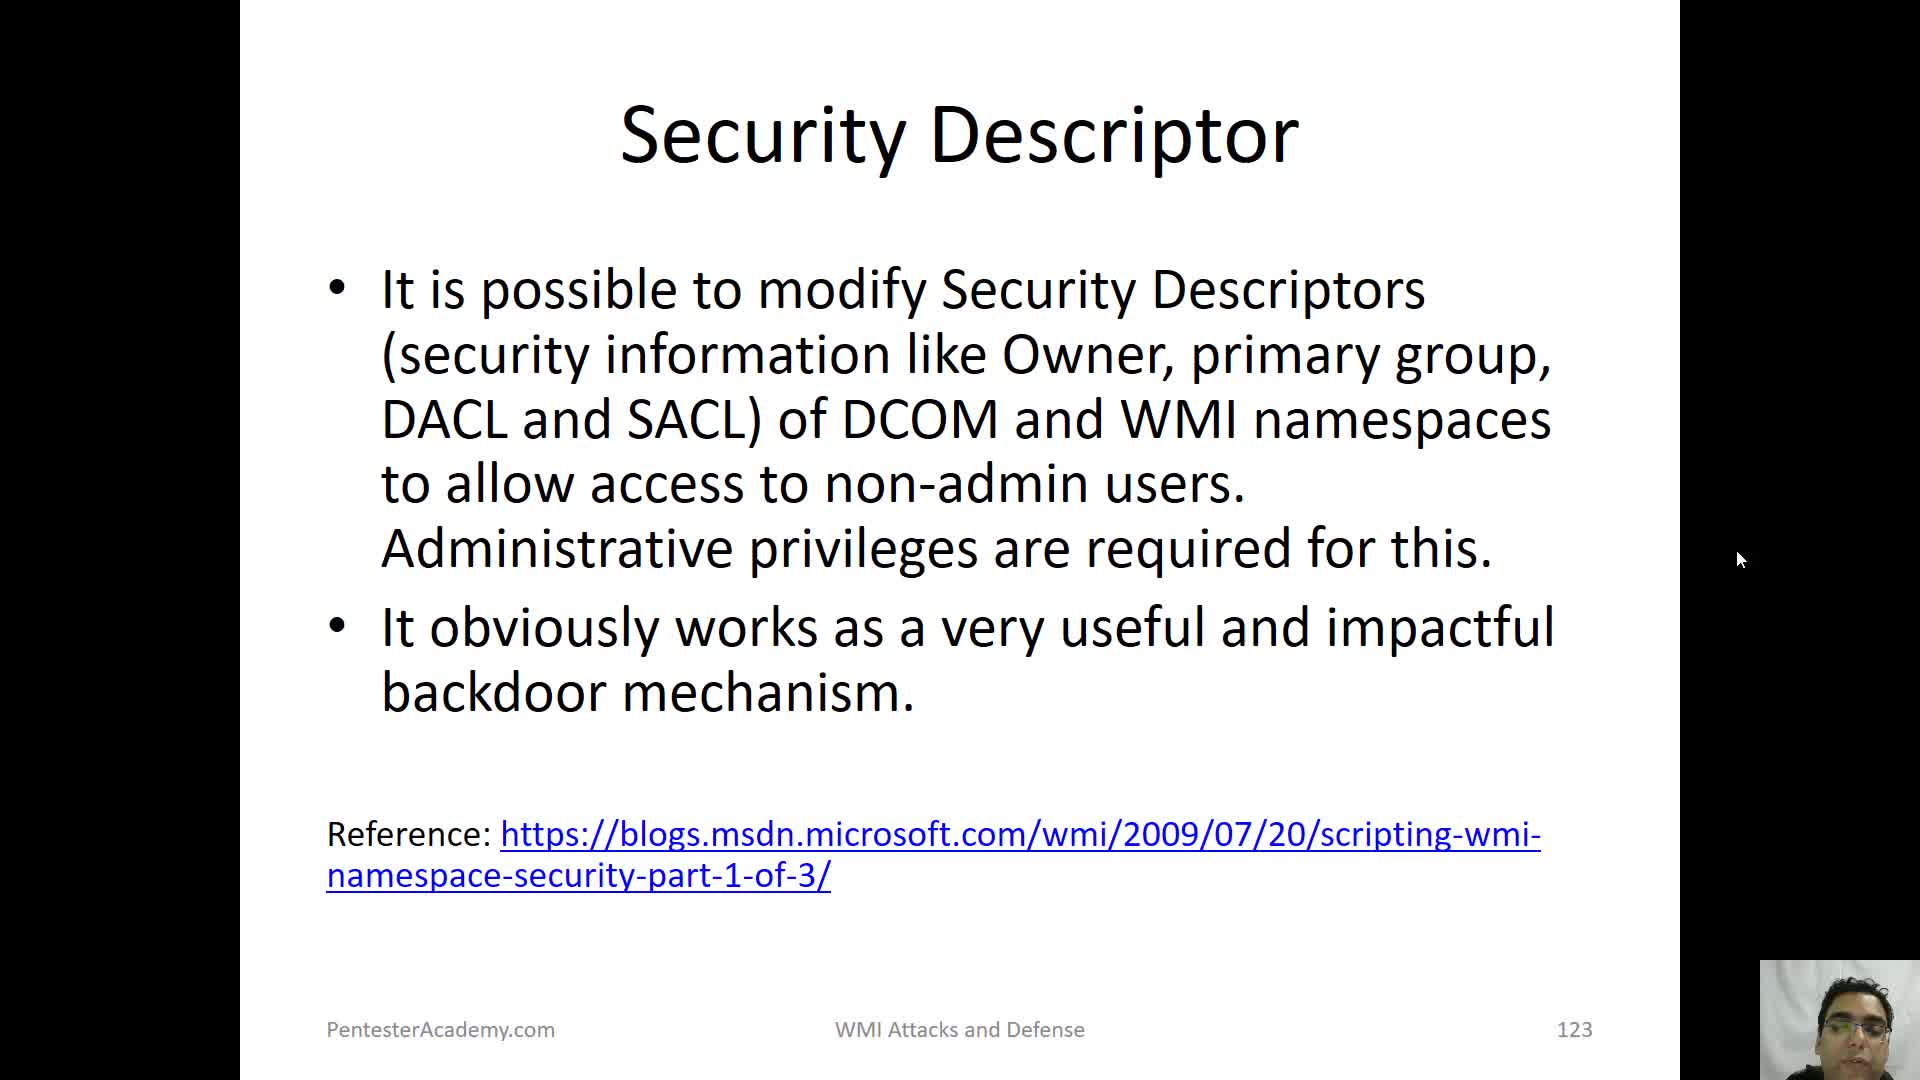 Security Descriptor | WMI Attacks and Defense